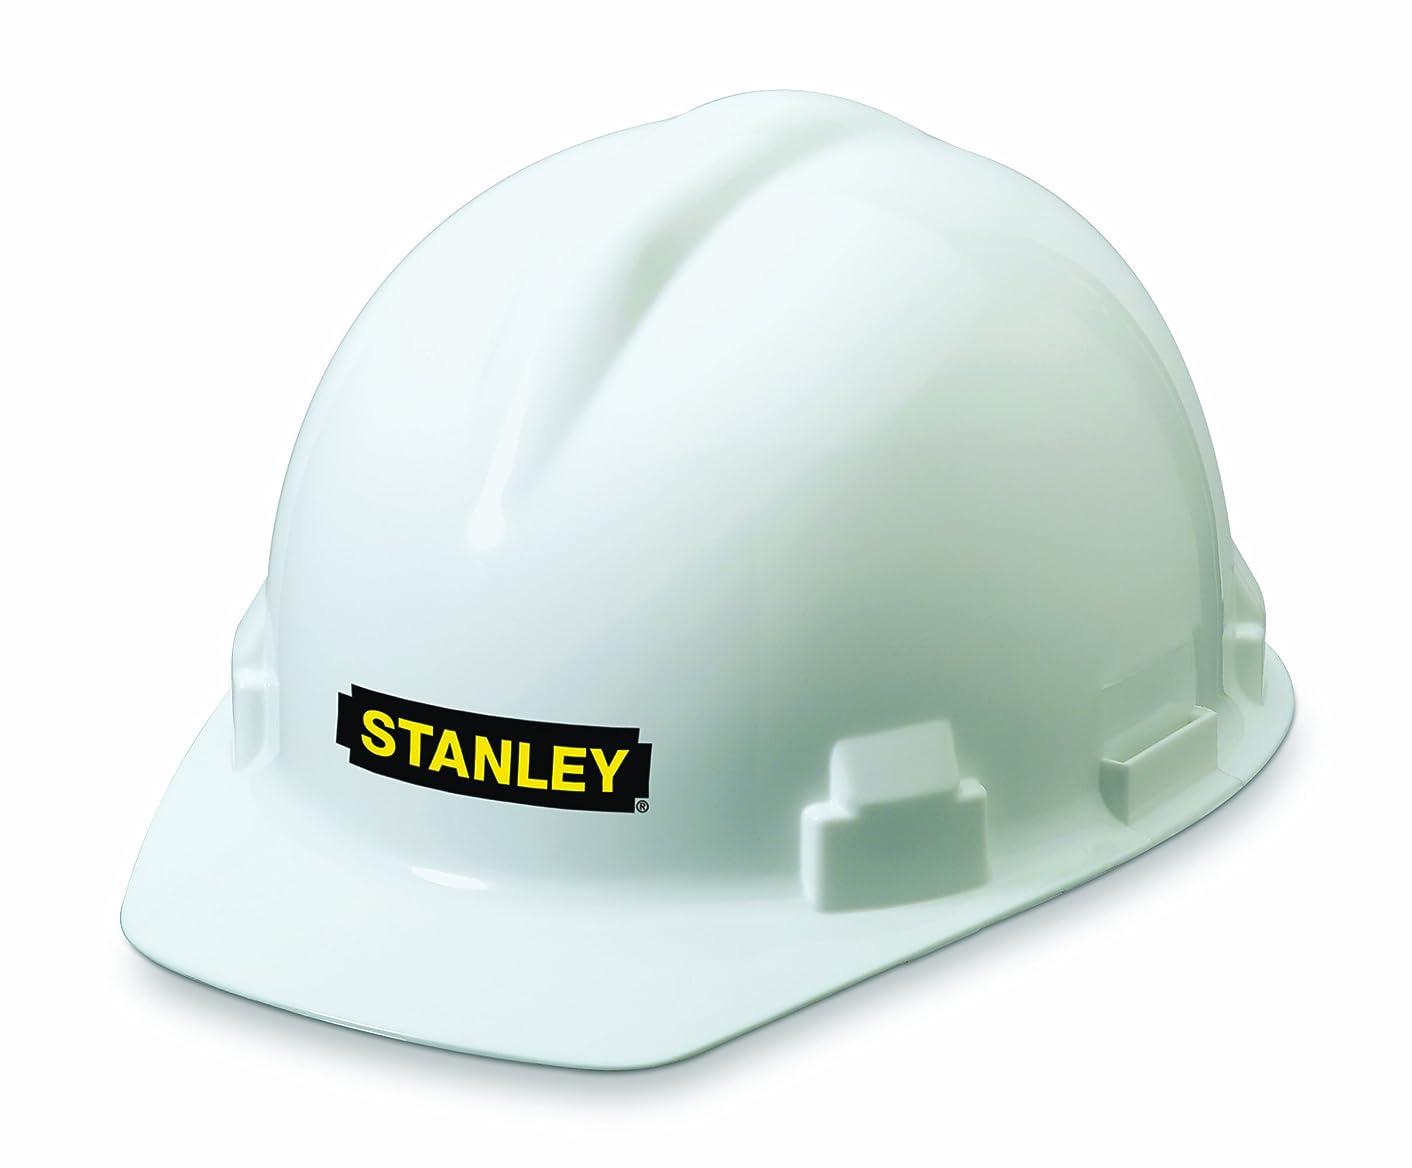 Stanley Ratchet Suspension White Hard Hat (RST-62004)